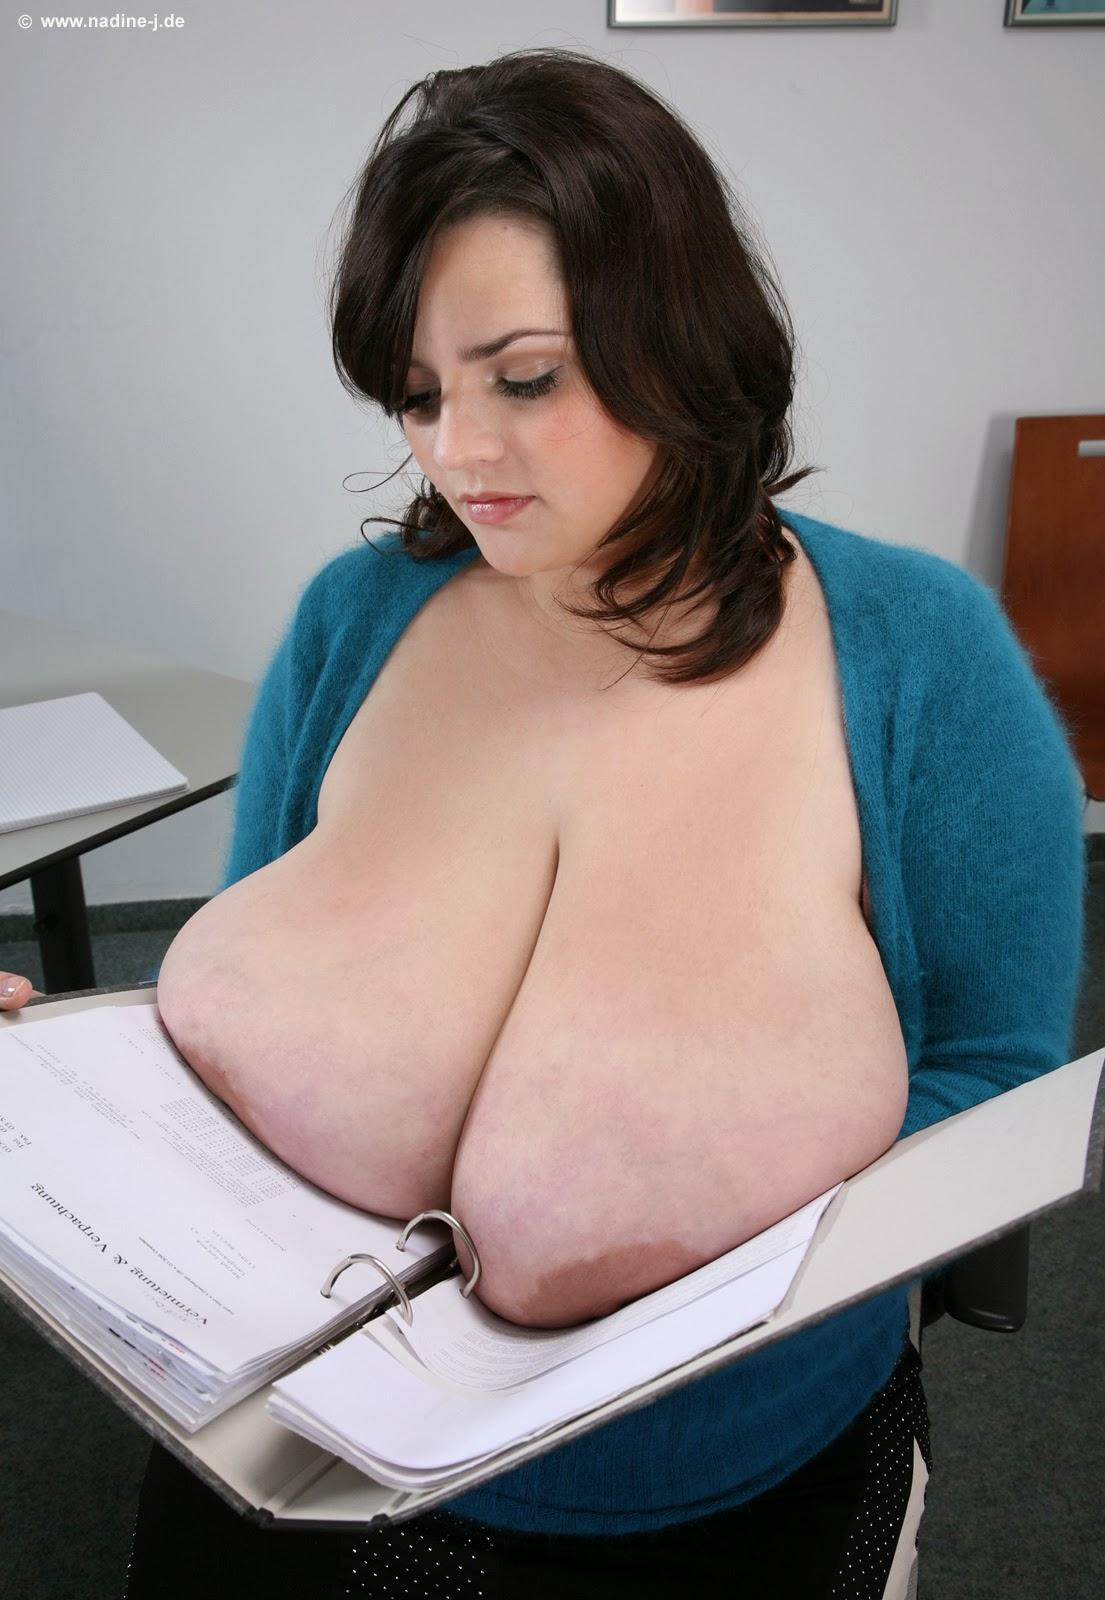 naked girl titts bouncing gif